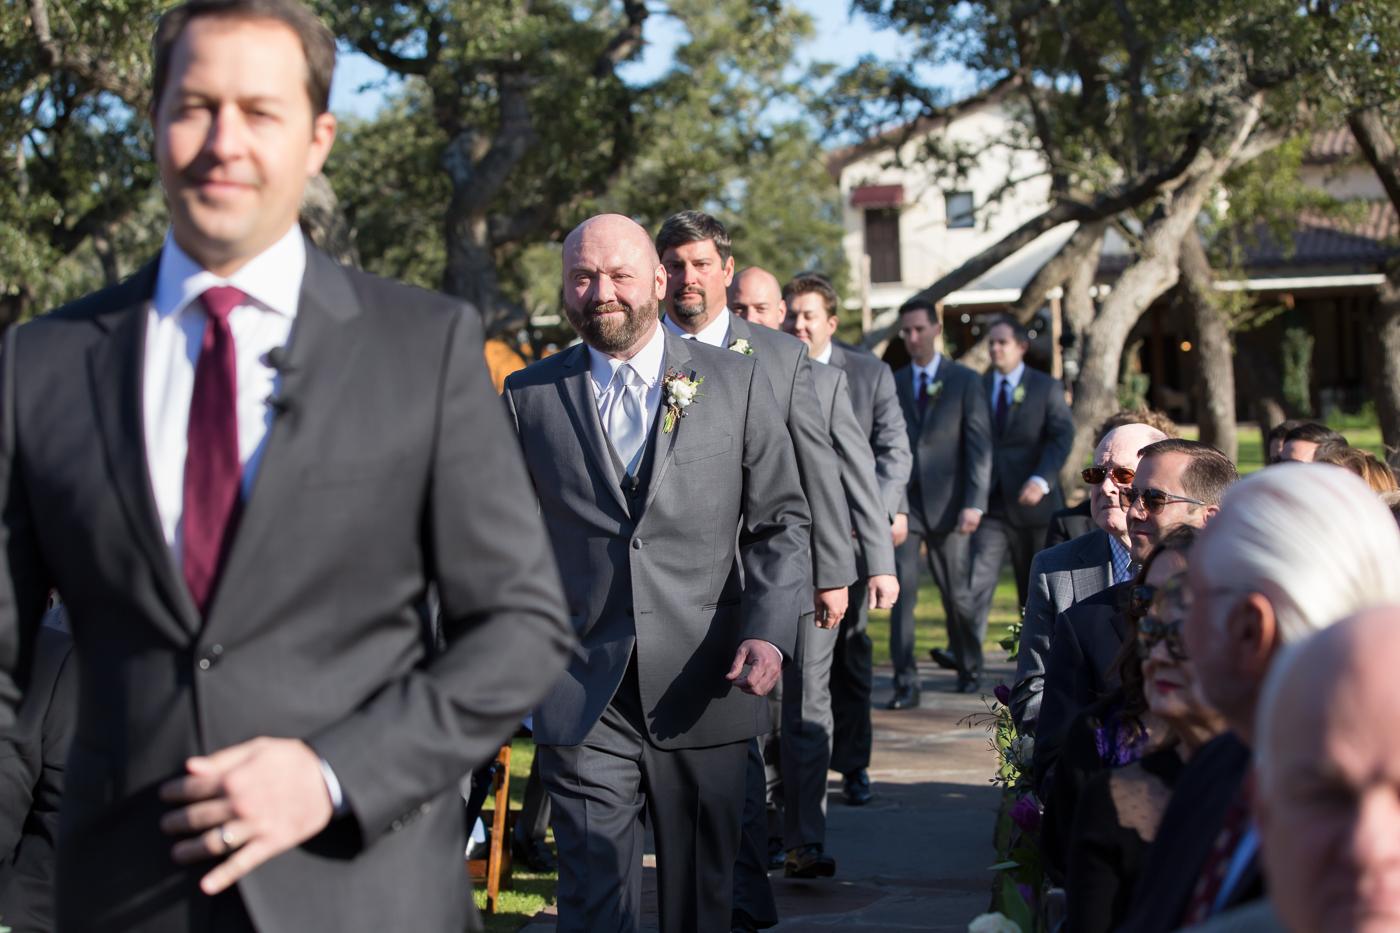 Austin-wedding-photo-and-video-018.jpg